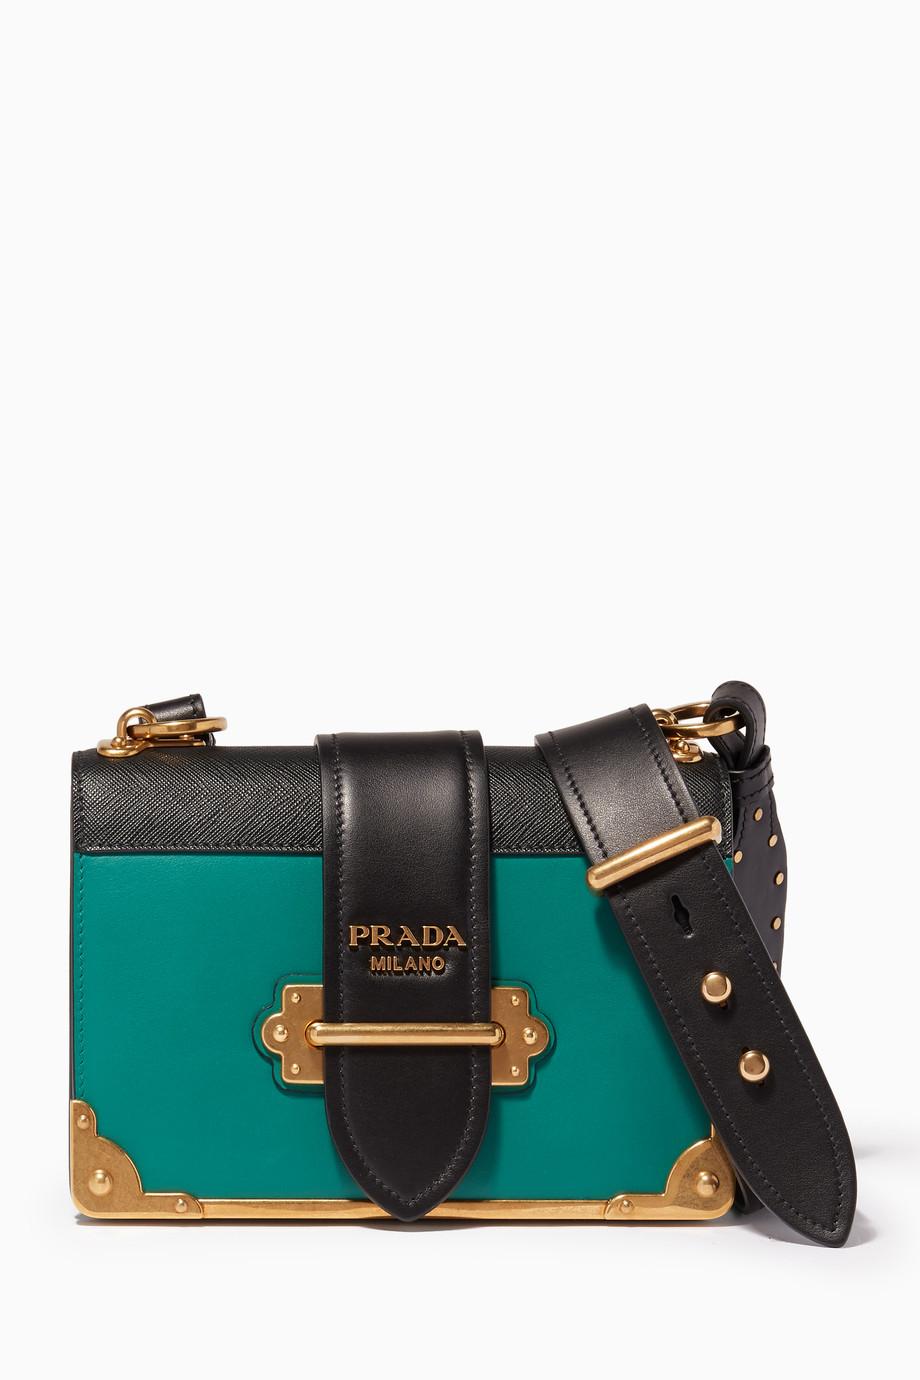 bee3affef692 Shop Prada Green Dark-Green   Black Cahier Leather Cross-Body Bag ...